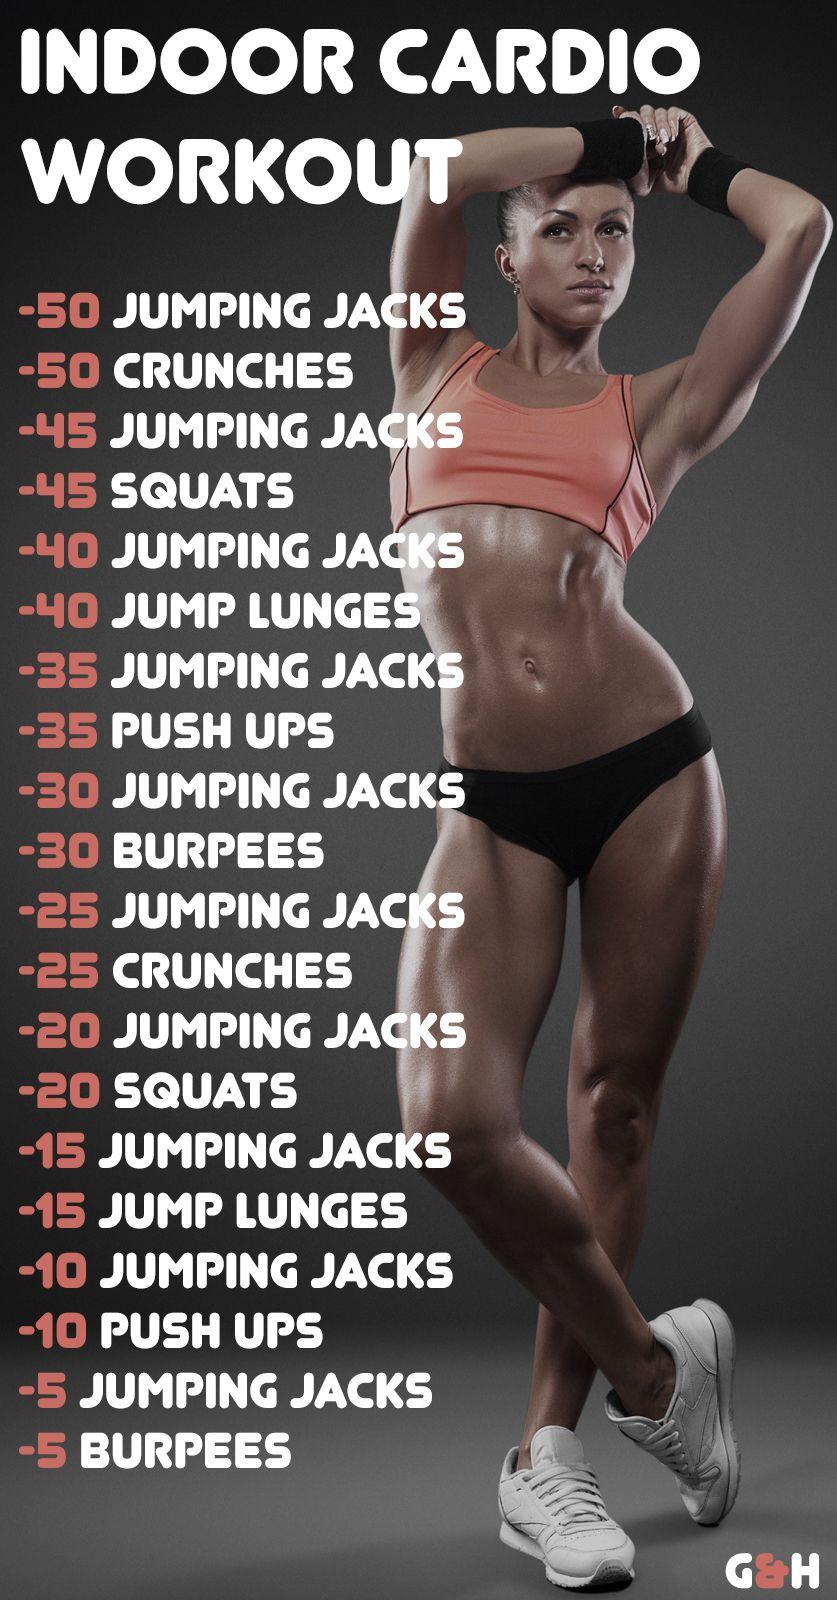 30-min Indoor Cardio Workout. Fat Burning Workout